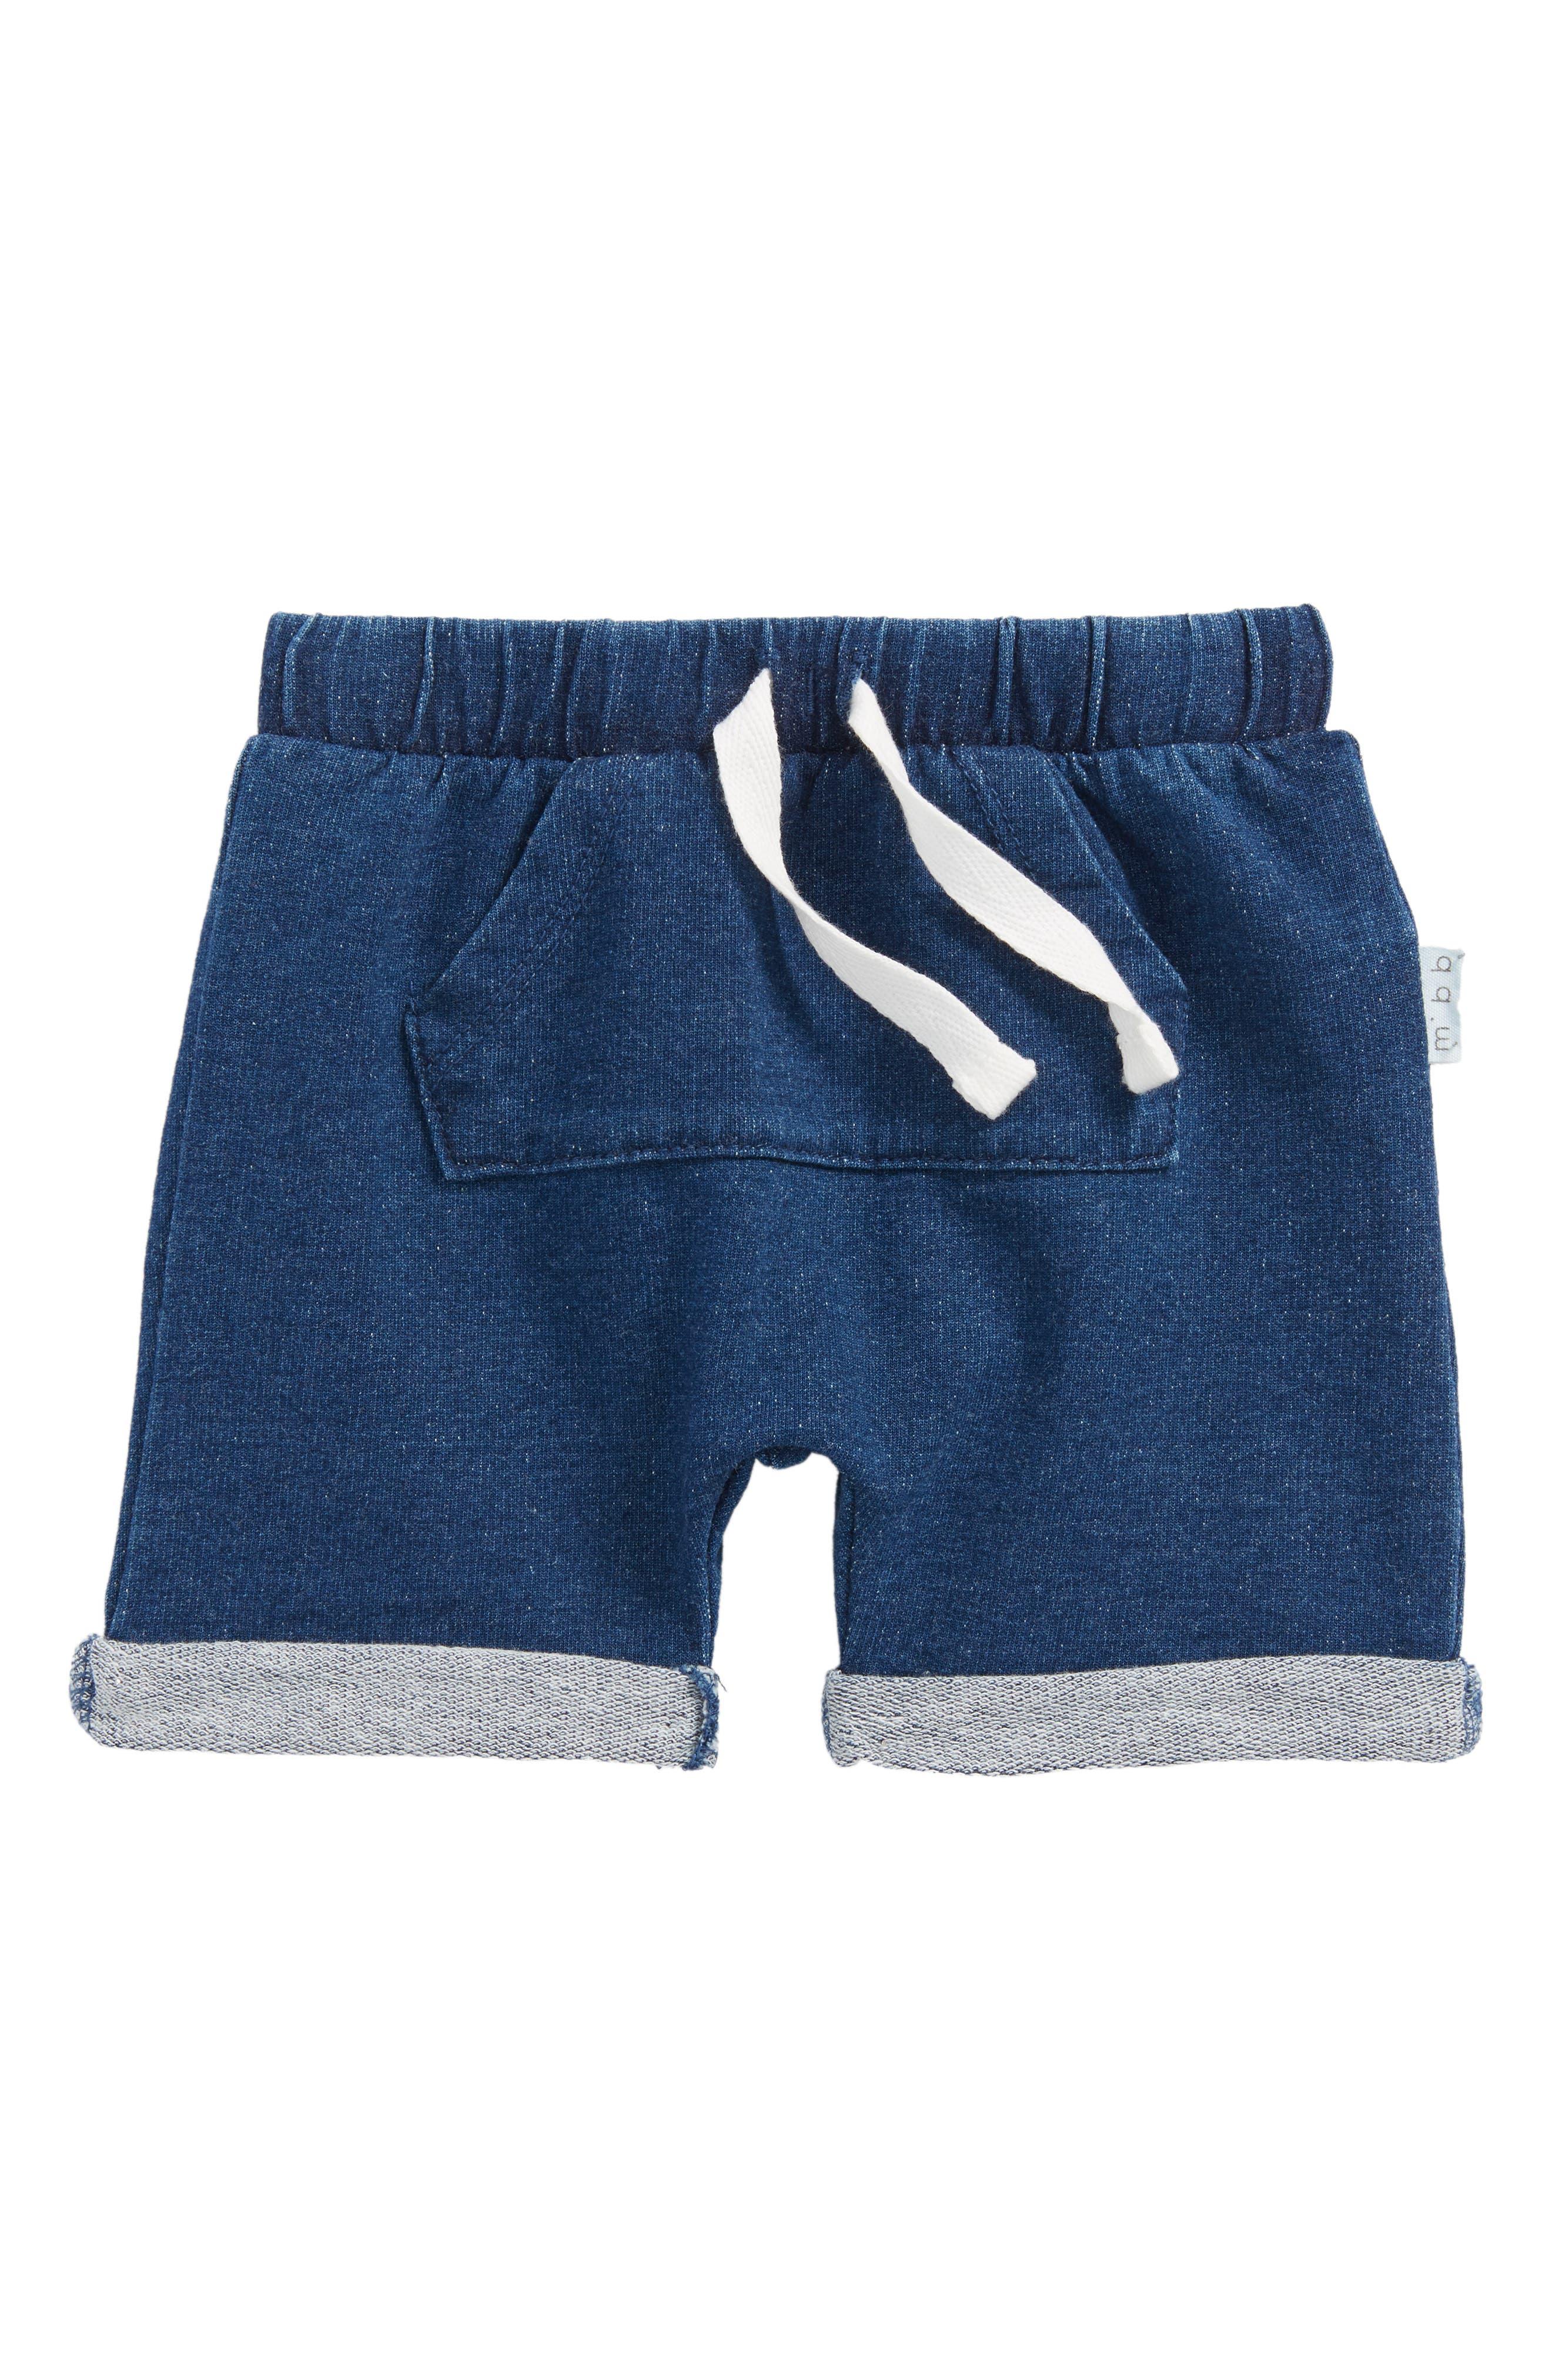 Denim Look Shorts,                             Main thumbnail 1, color,                             Blue